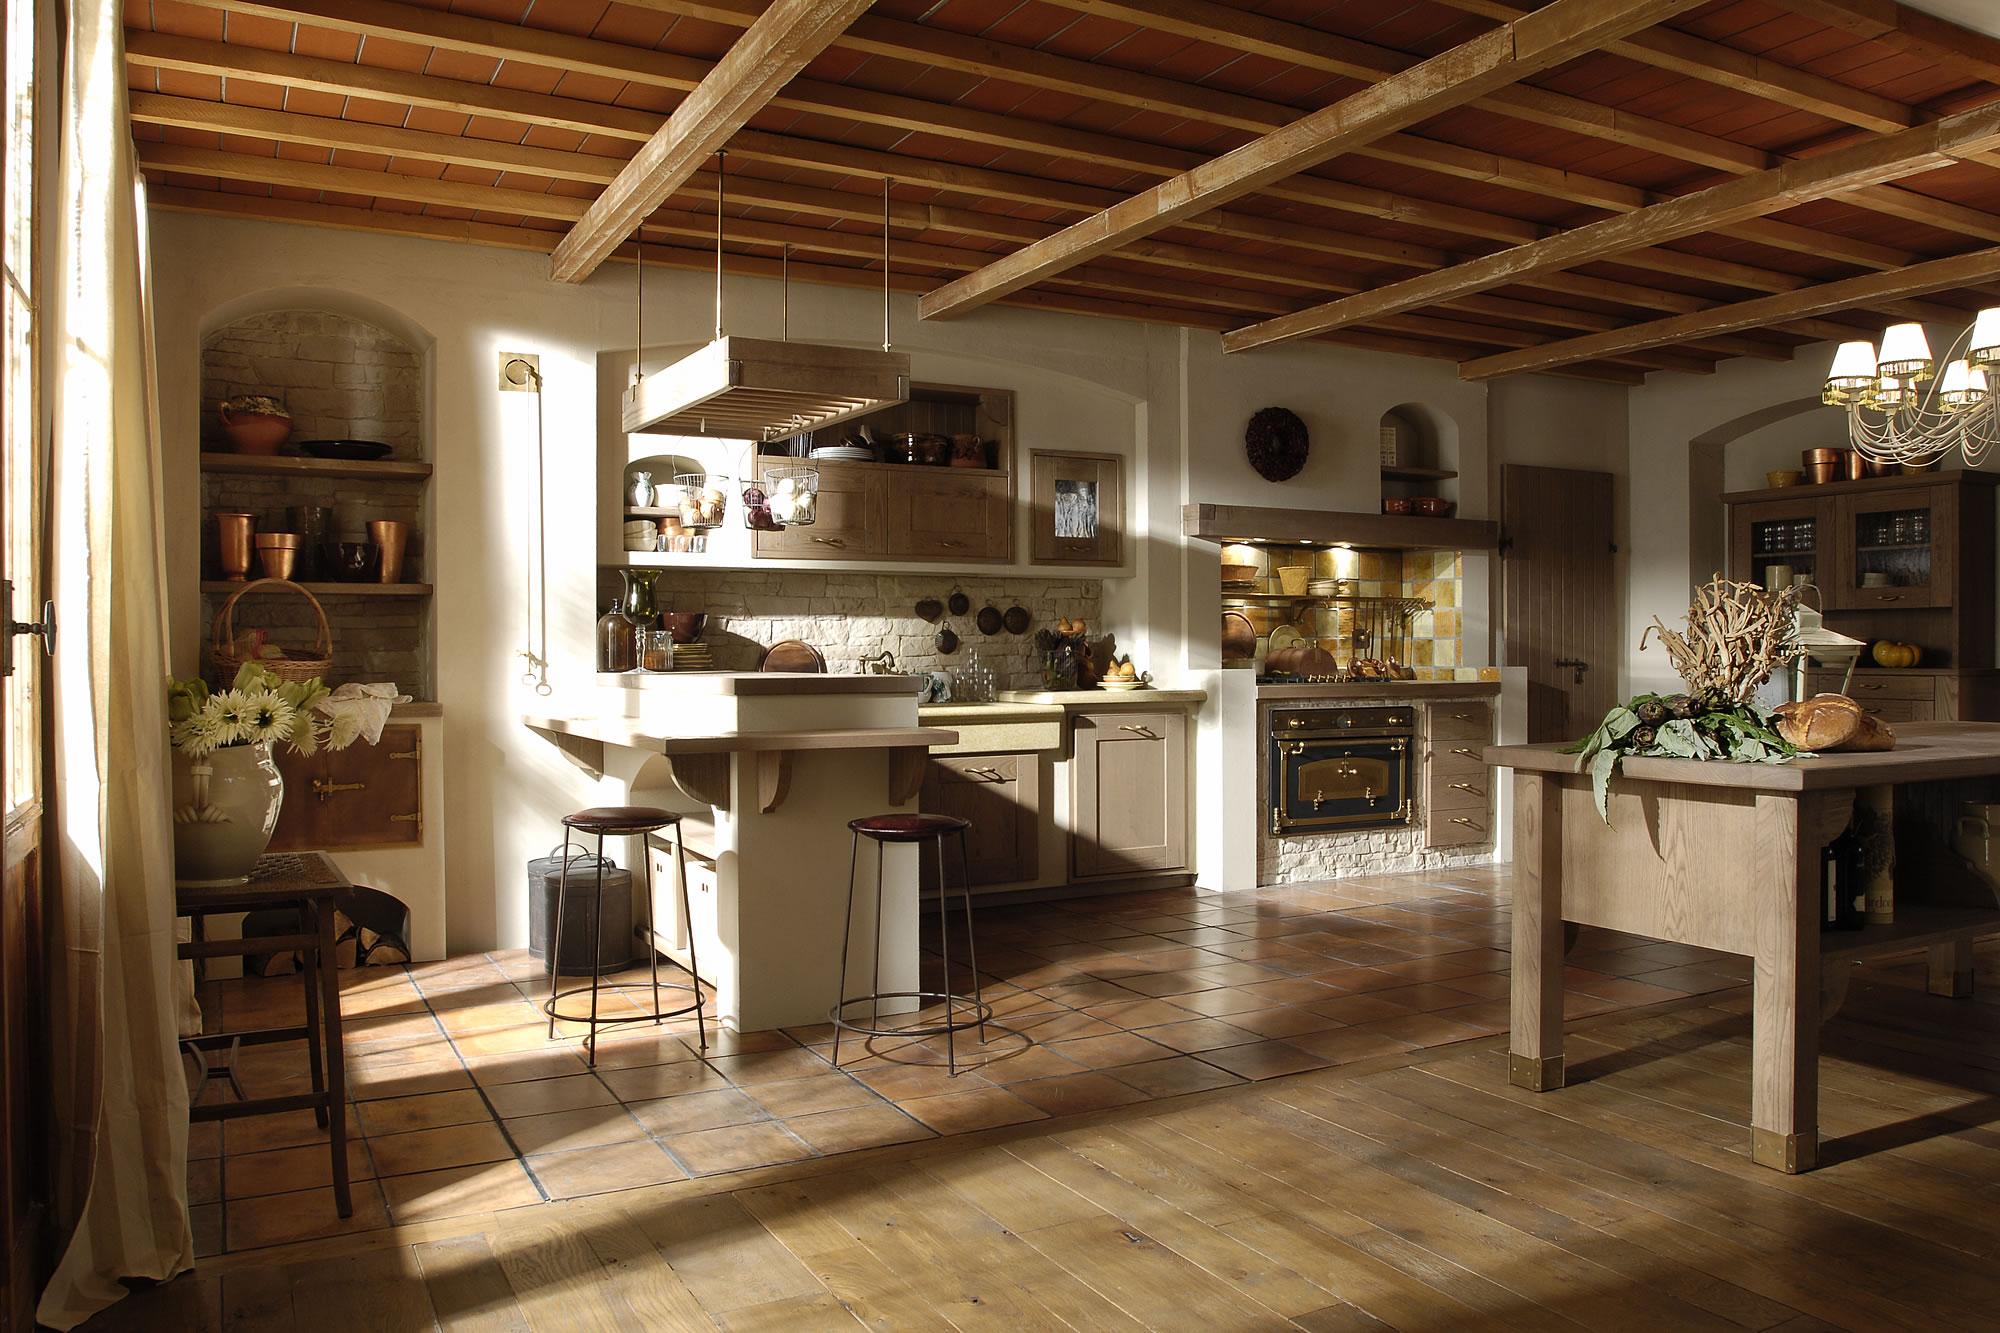 Cucine bianche country chic in muratura cucine in legno massello rustiche Empoli Firenze